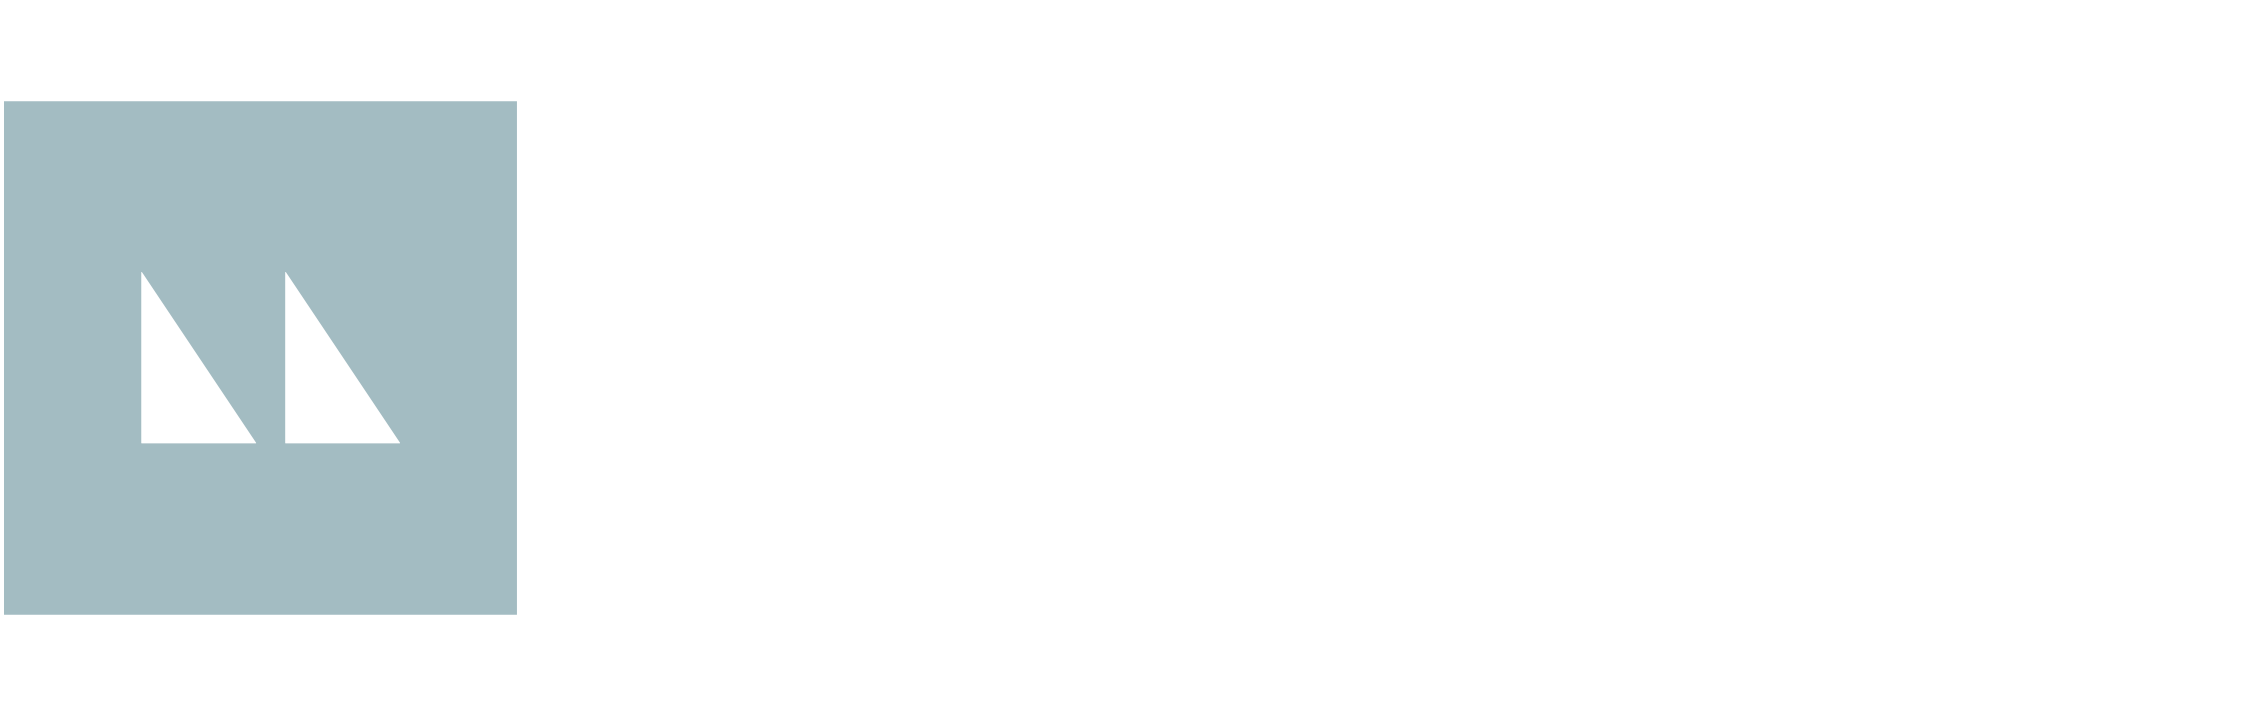 Motto Mortgage Logo